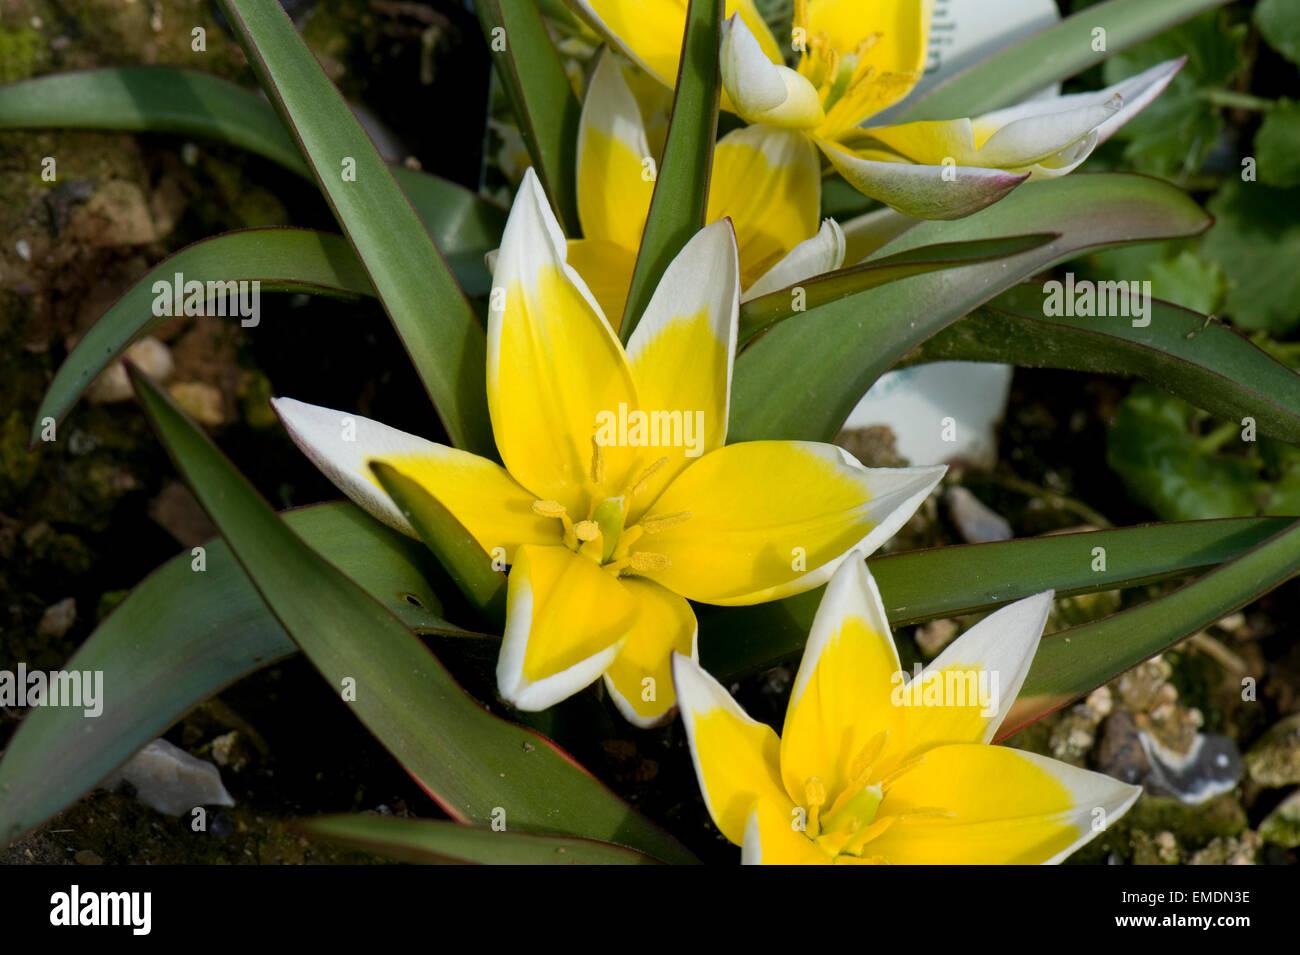 Yellow And White Flowers Of Species Tulip Tulipa Tarda Low Growing